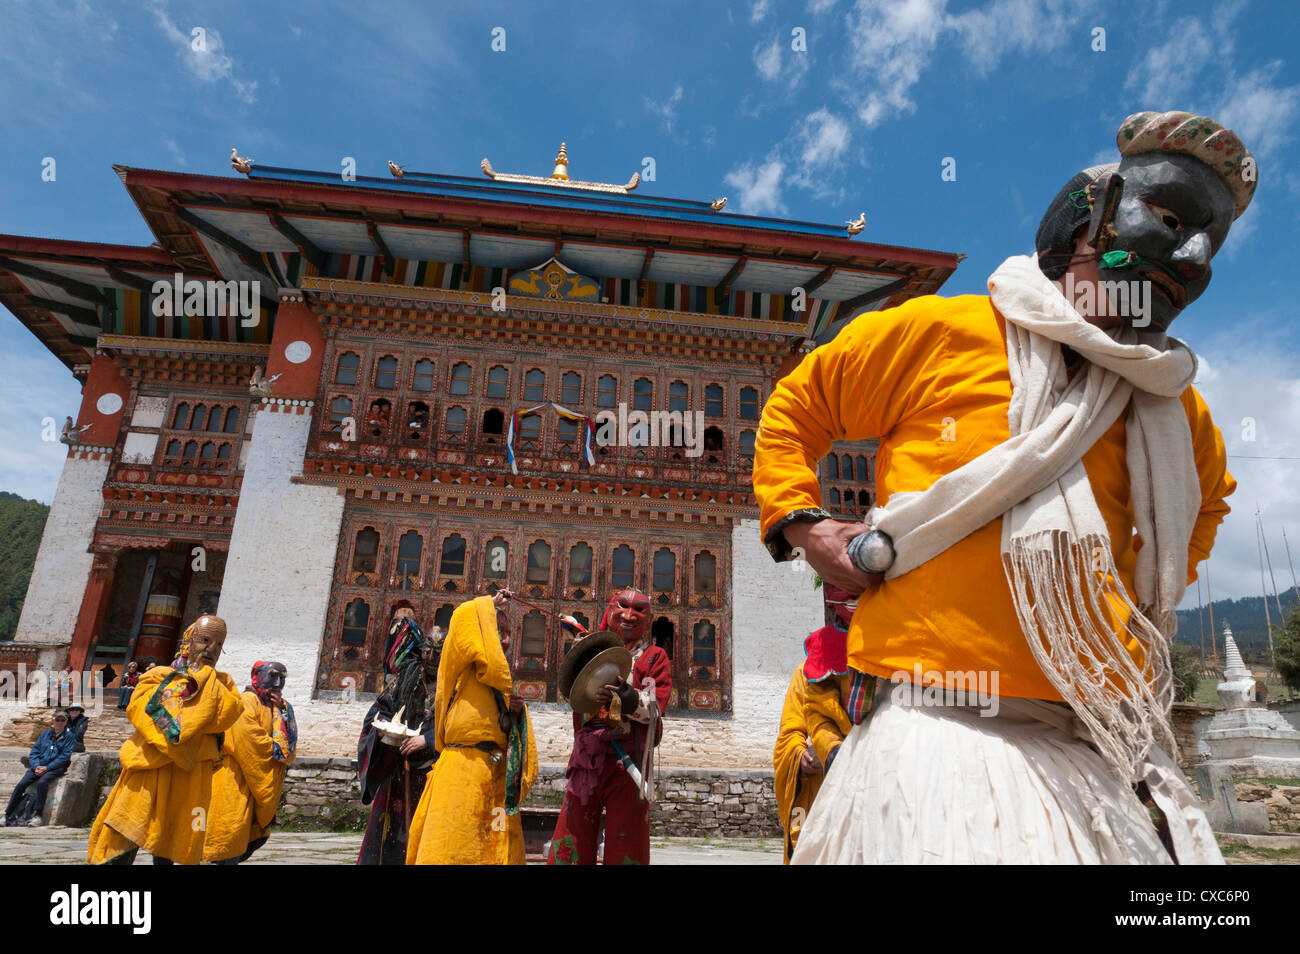 Traditional Buddhist festival in Ura, Bumthang, Bhutan, Asia - Stock Image